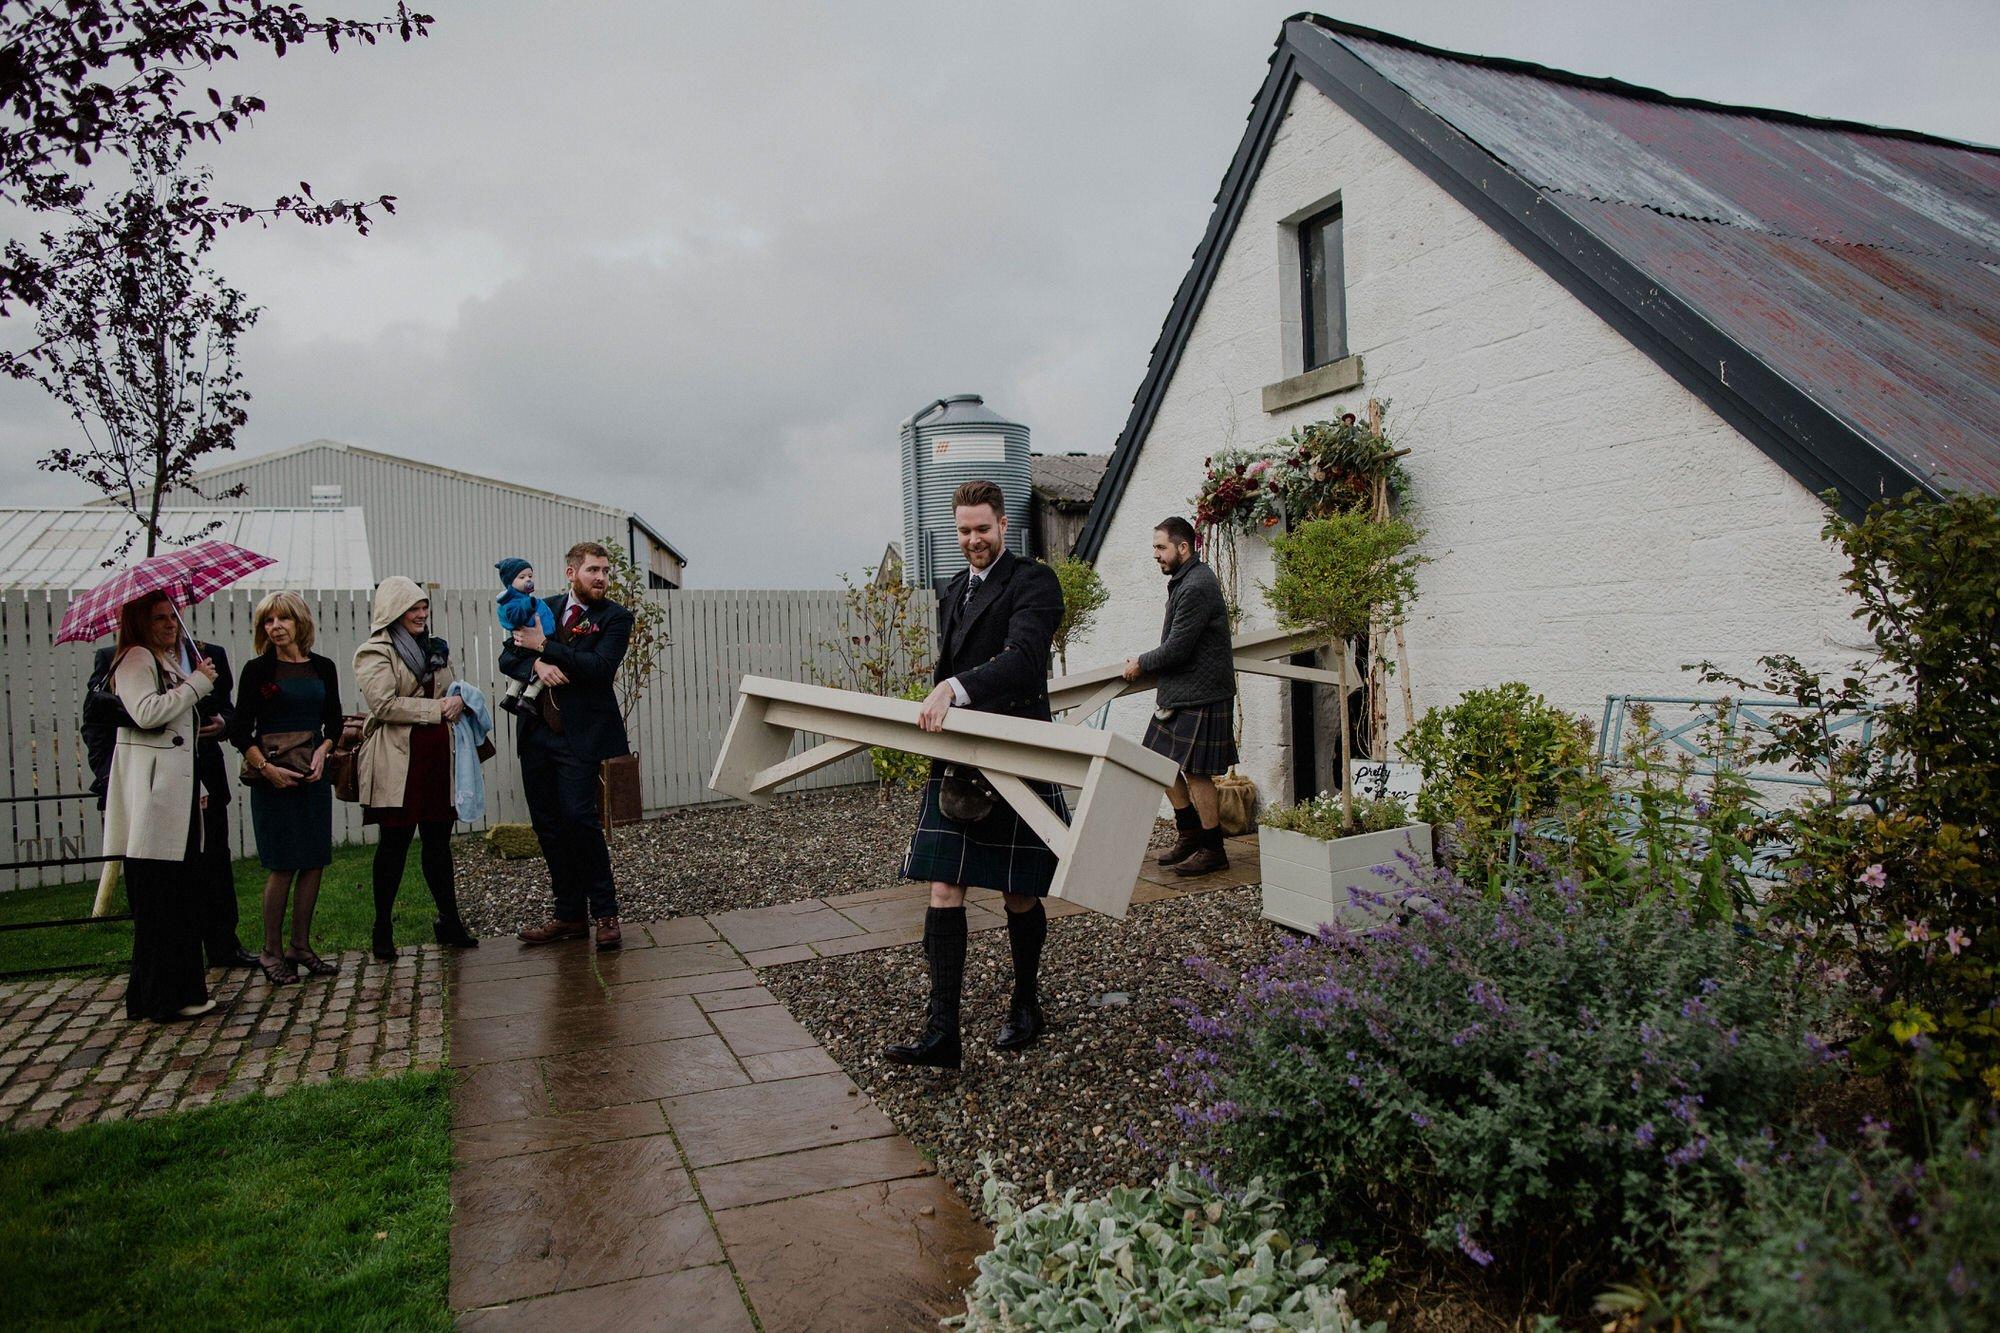 013 TIN SHED KNOCKRAICH FARM WEDDING ALTERNATIVE BRIDE ZOE ALEXANDRA PHOTOGRAPHY